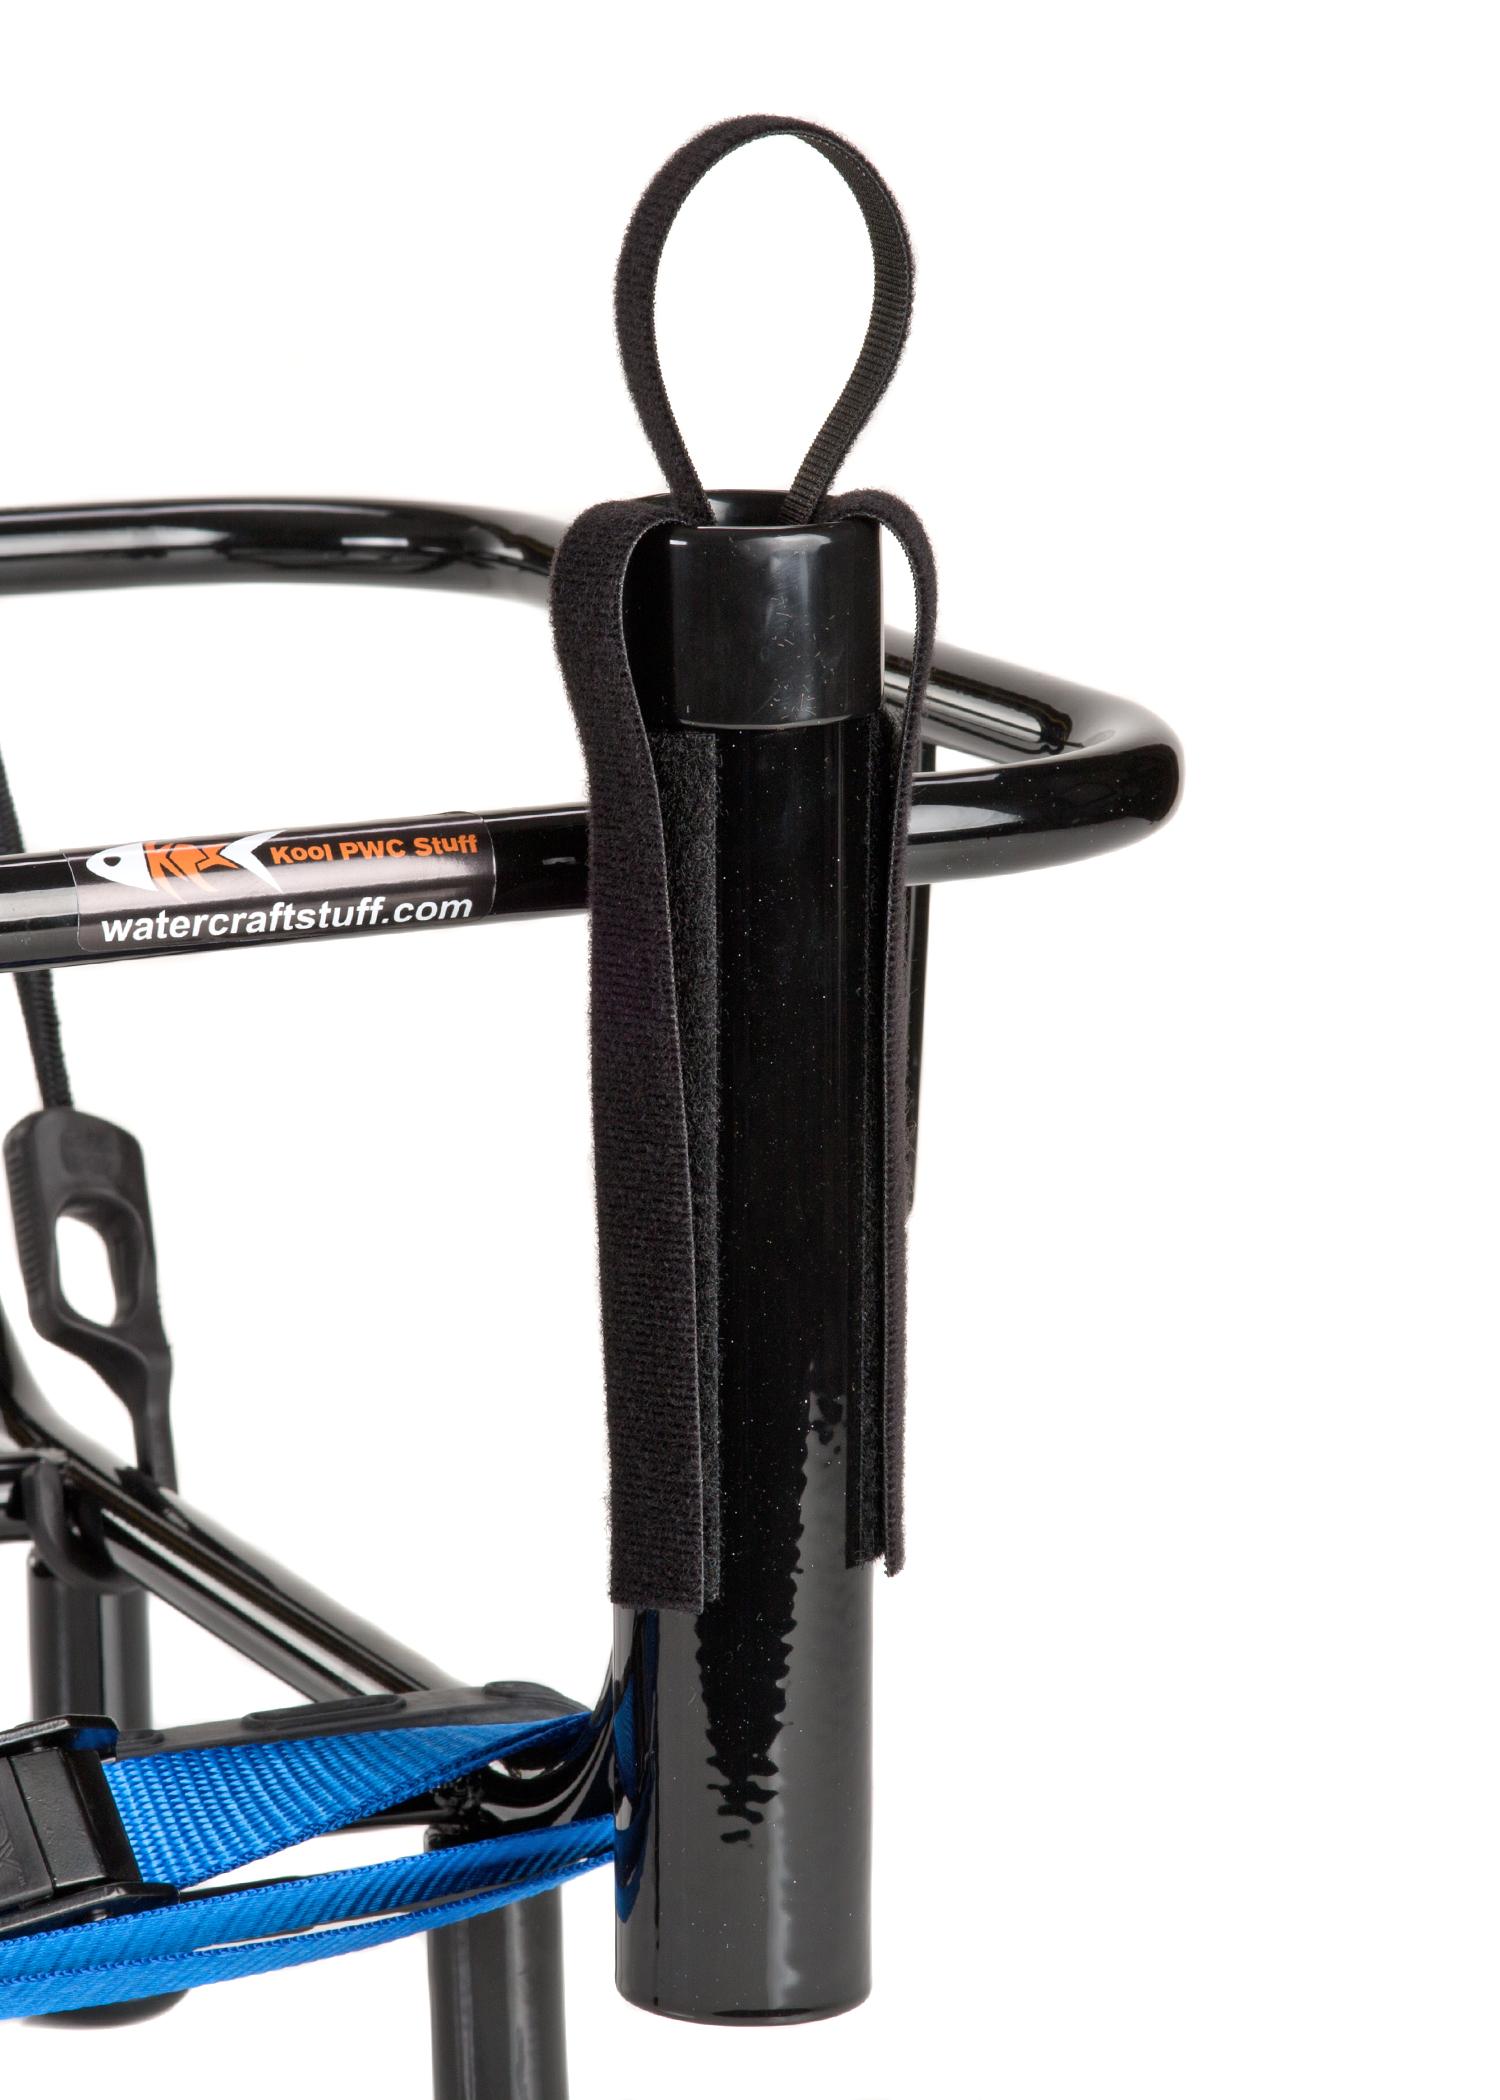 Jetski fishing rack with 4 rod holders kool pwc for Fishing rod holders